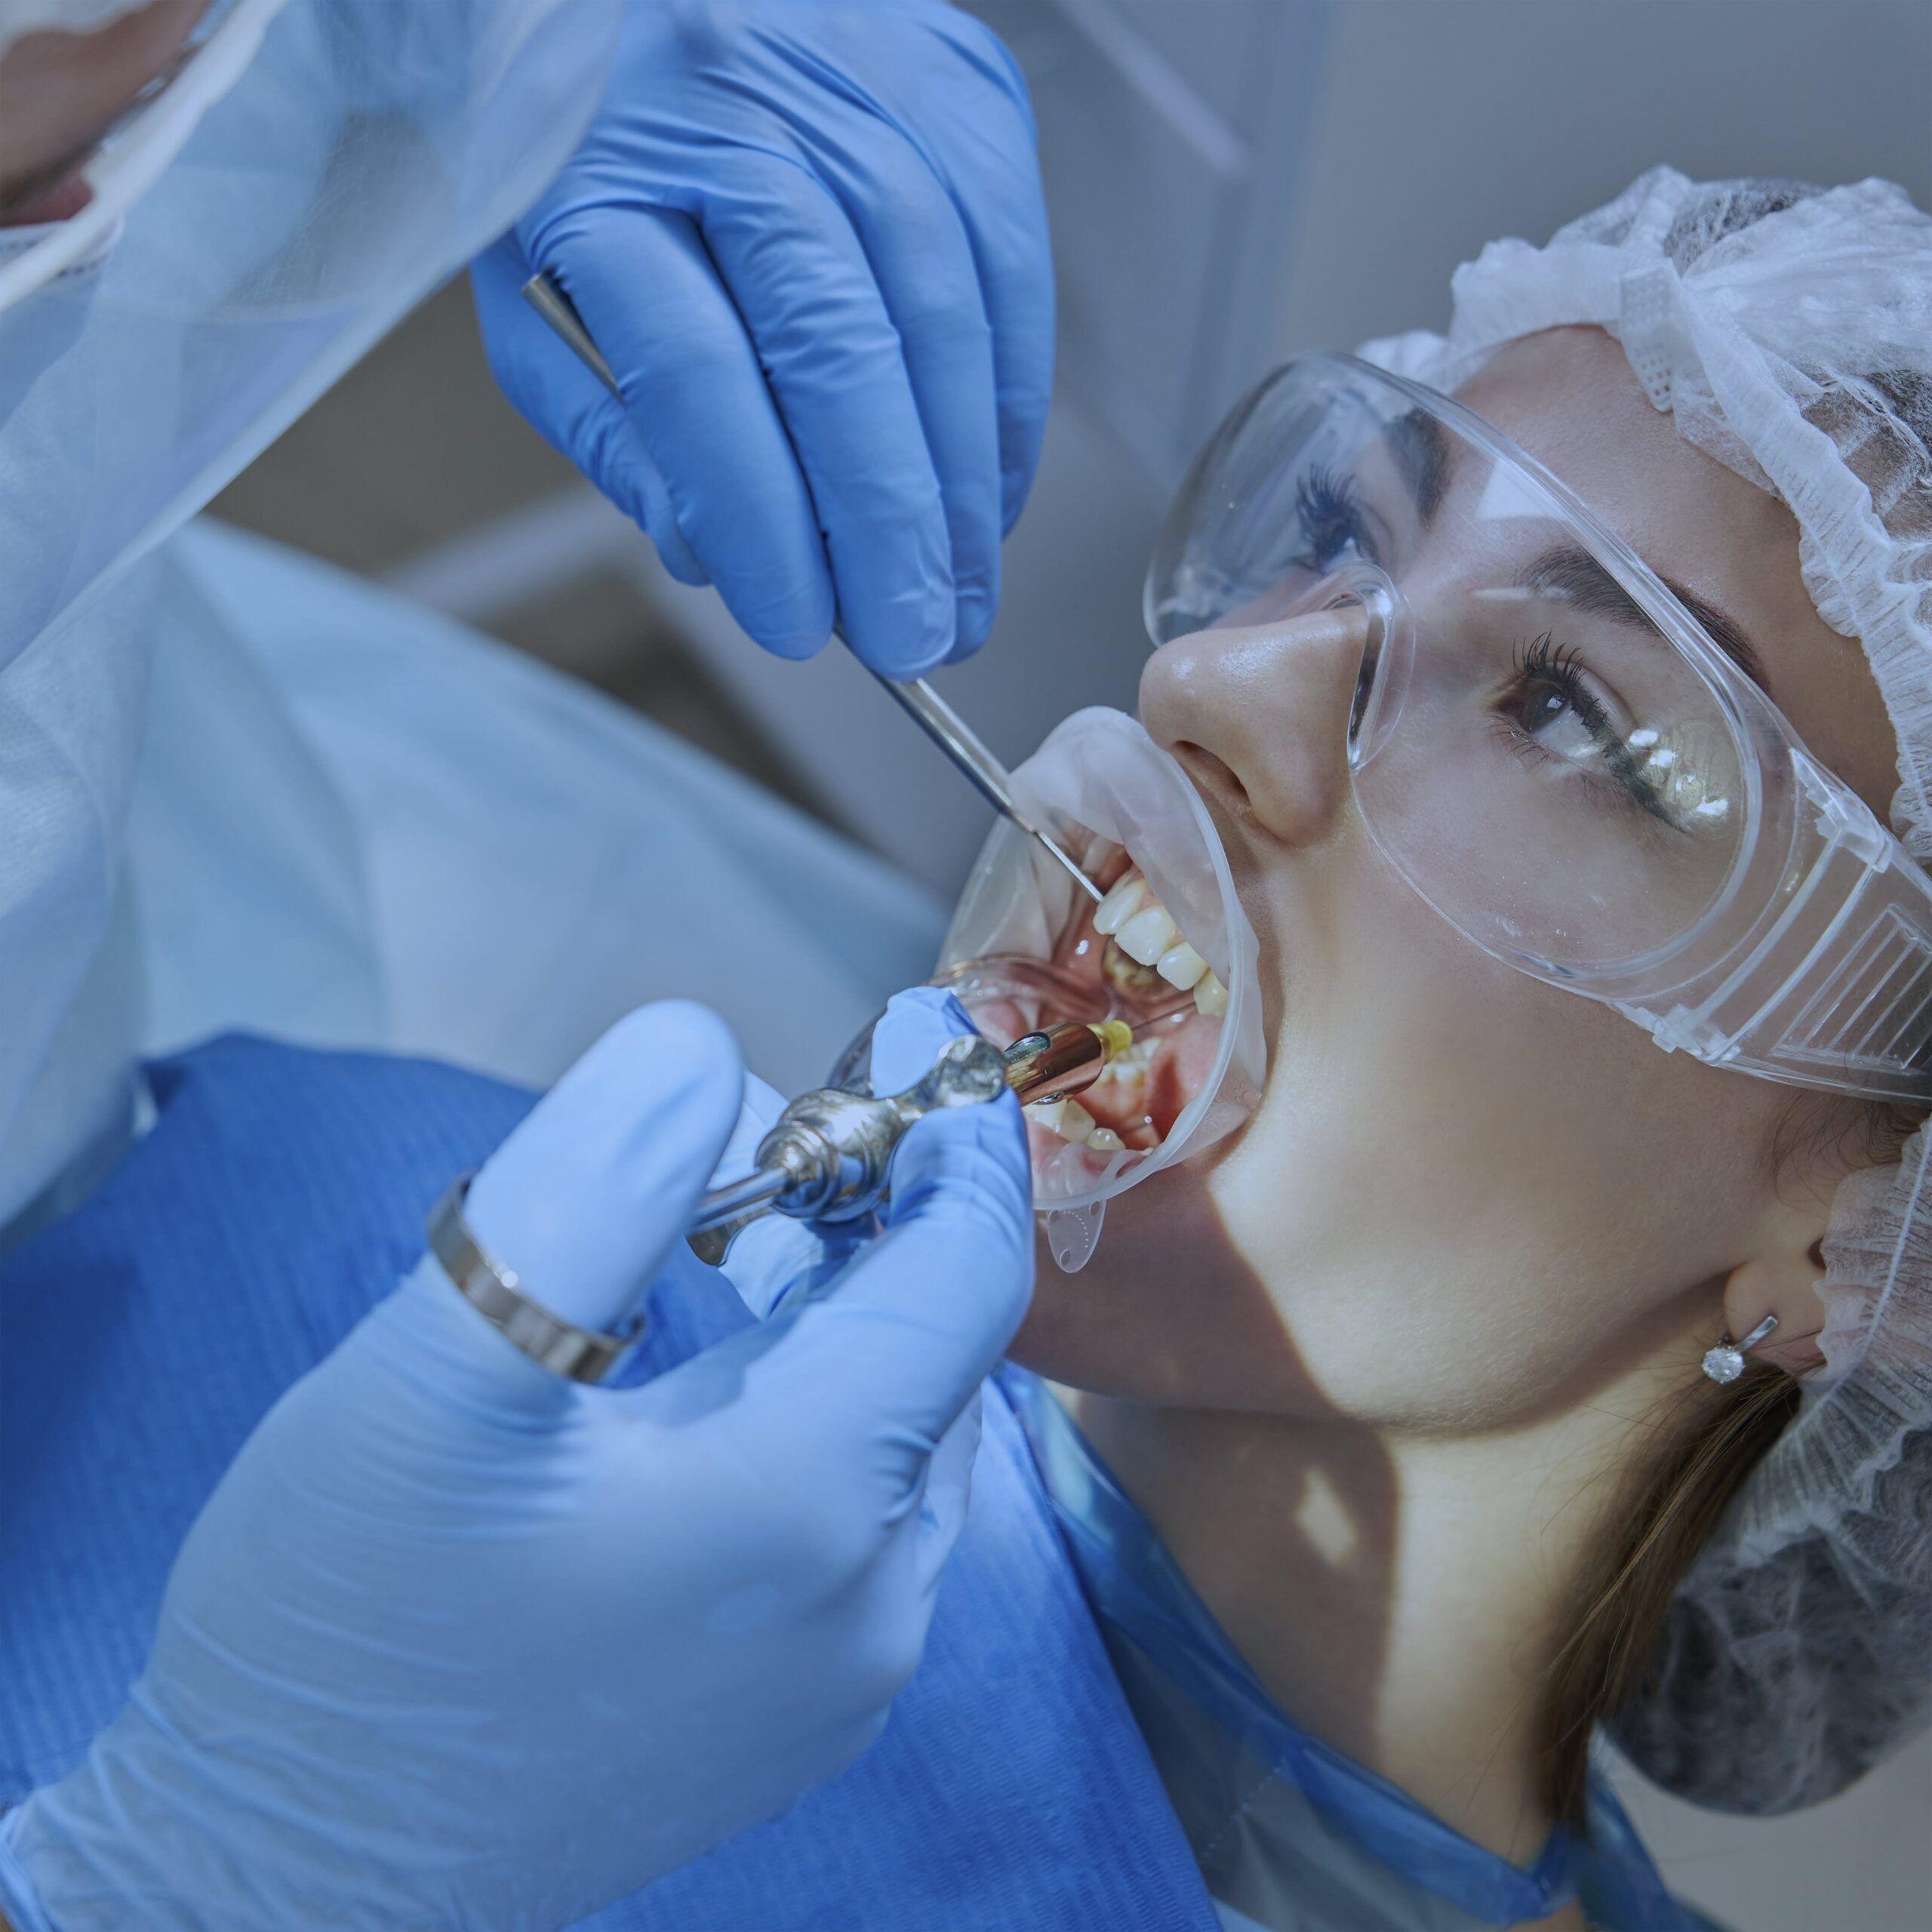 inyectables dentales [object object] Uso de vasoconstrictores en pacientes con Diabetes Mellitus inyeccion min scaled